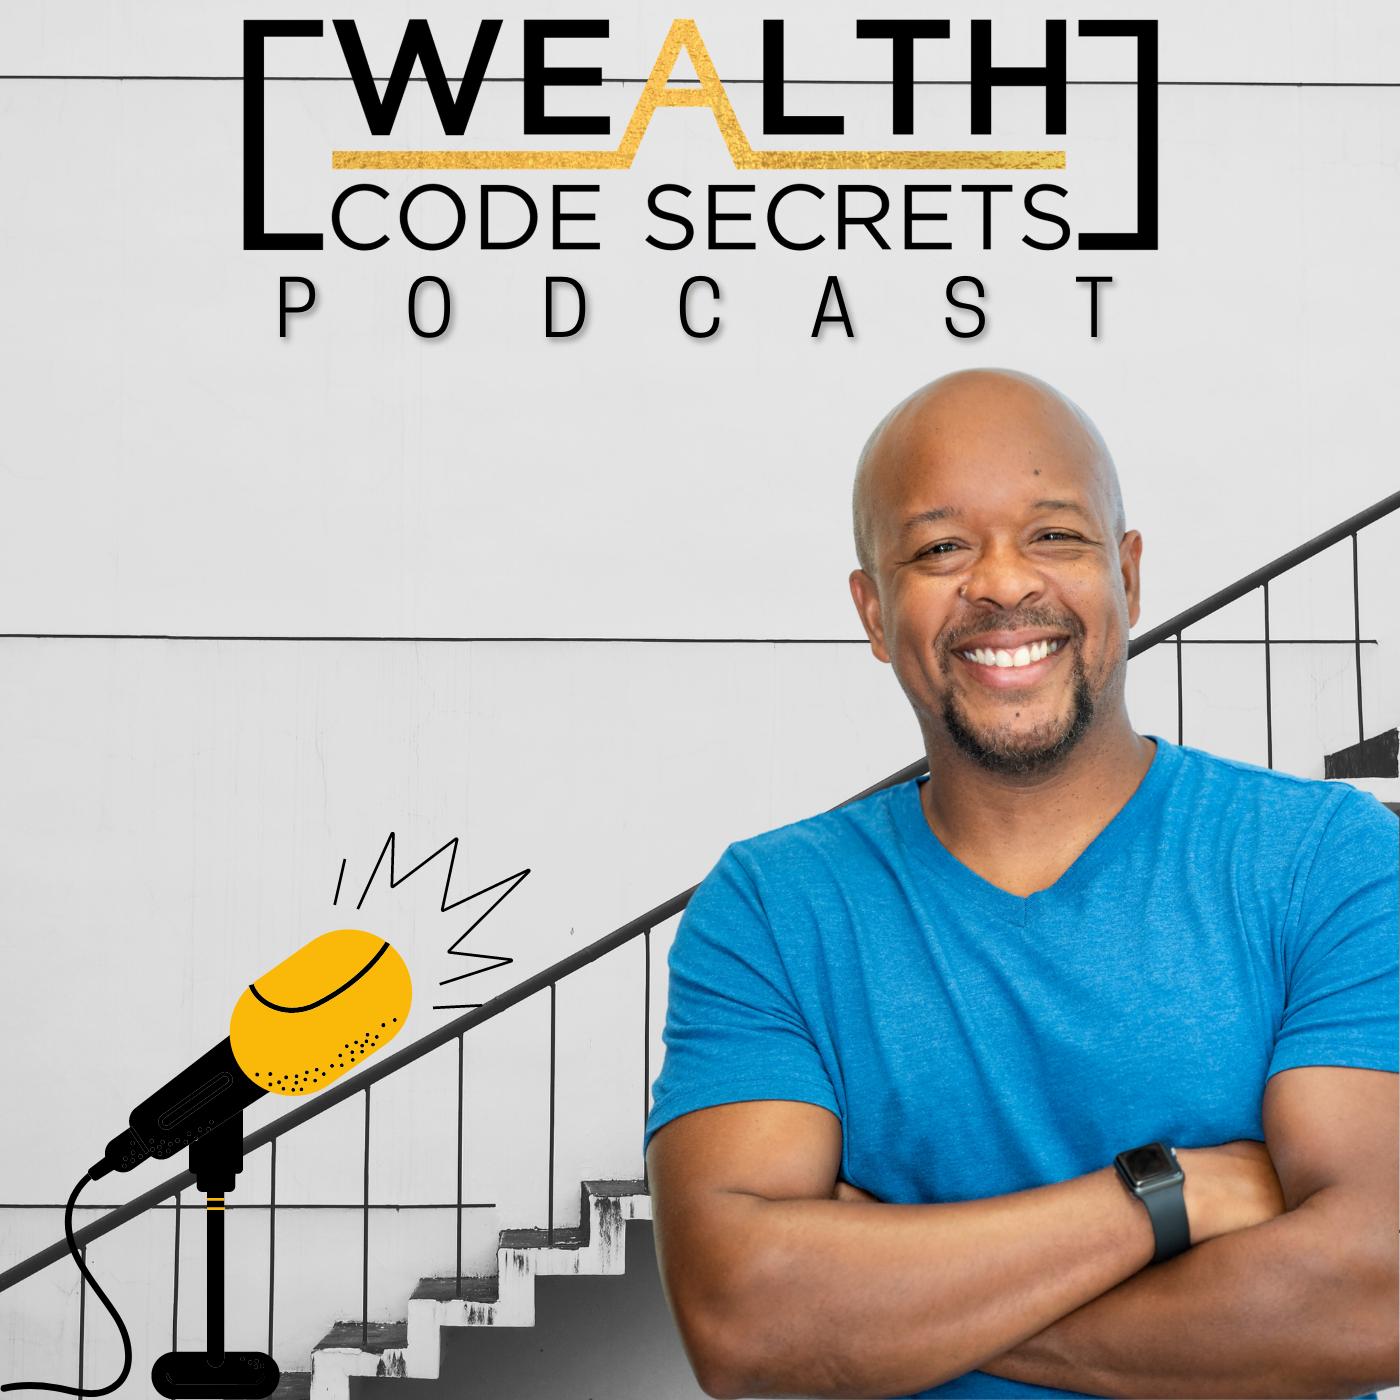 Wealth Code Secrets